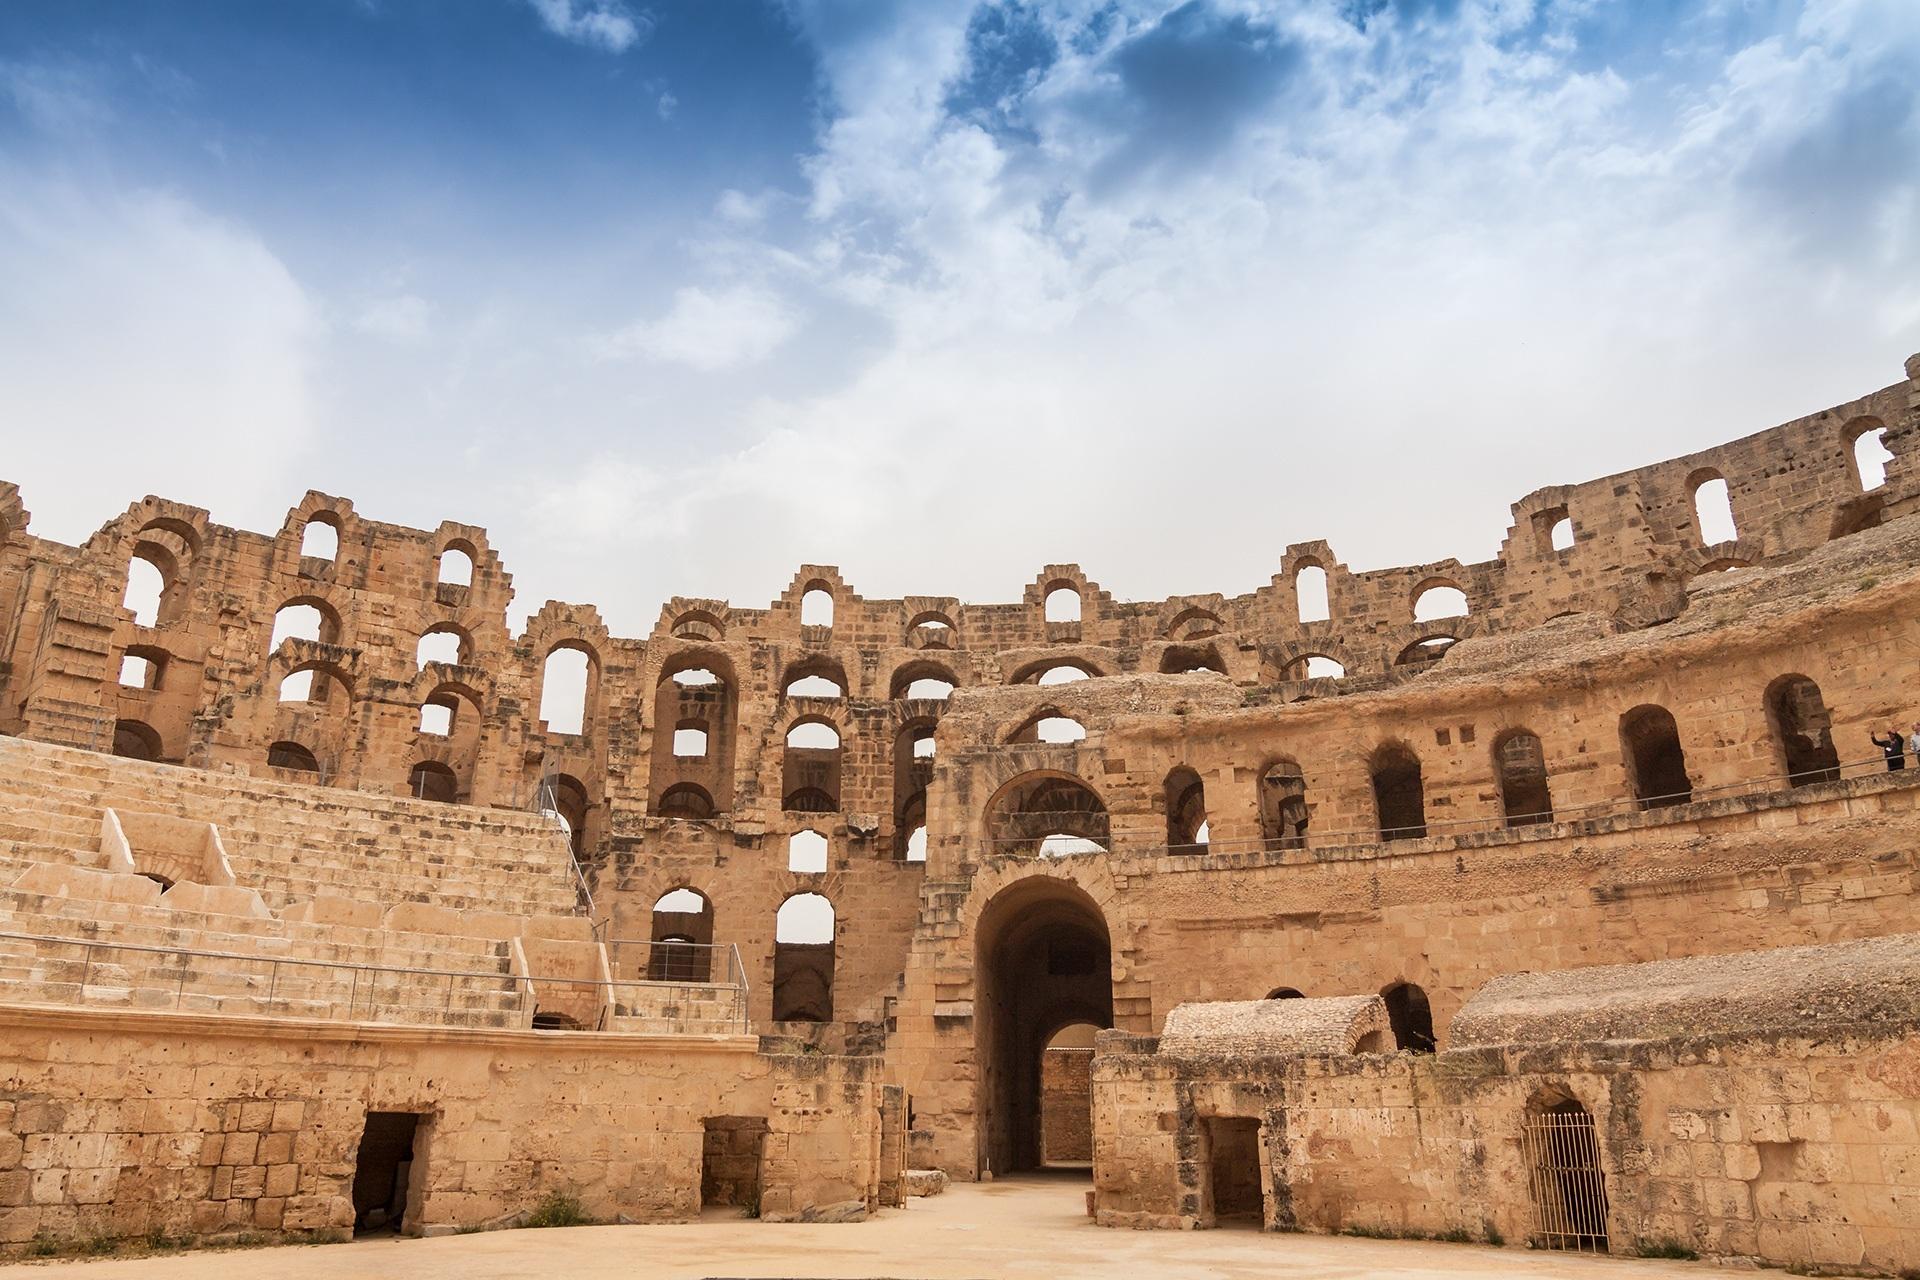 Africa, free, photo, architecture, antiquity, archeology, amphitheater, gladiators, ruin, stone, sky, tourism, travel